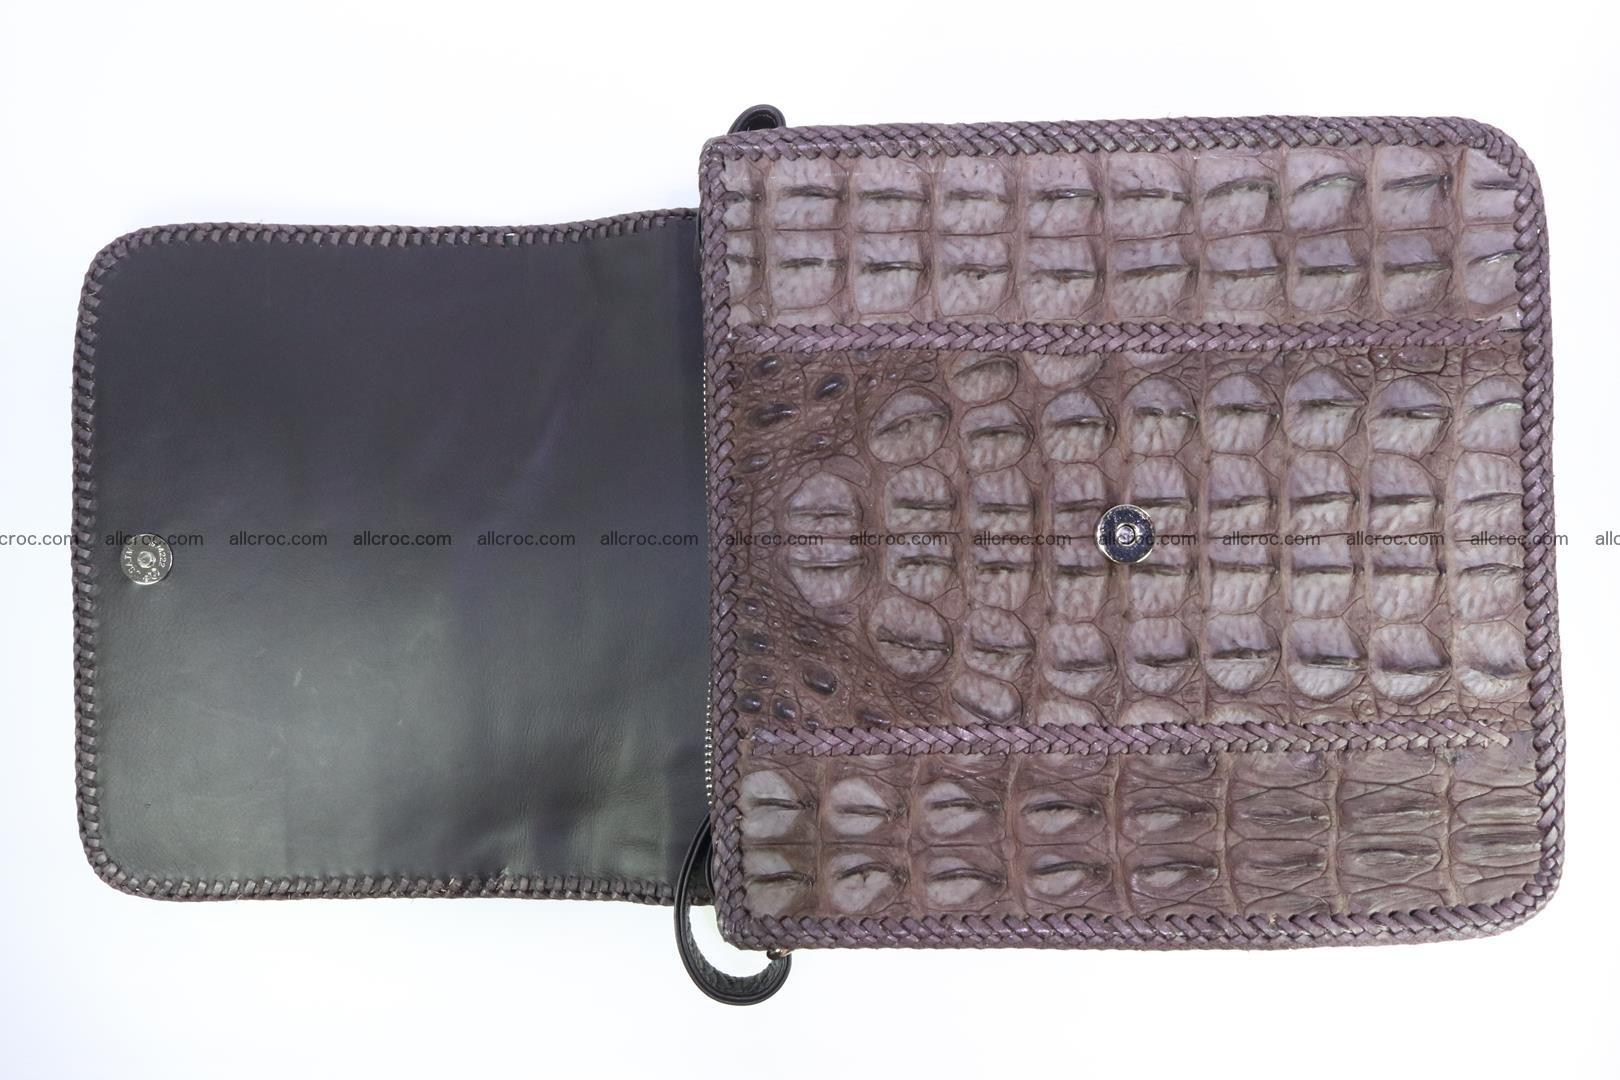 Сrocodile skin shoulder bag with braided edges 142 Foto 11